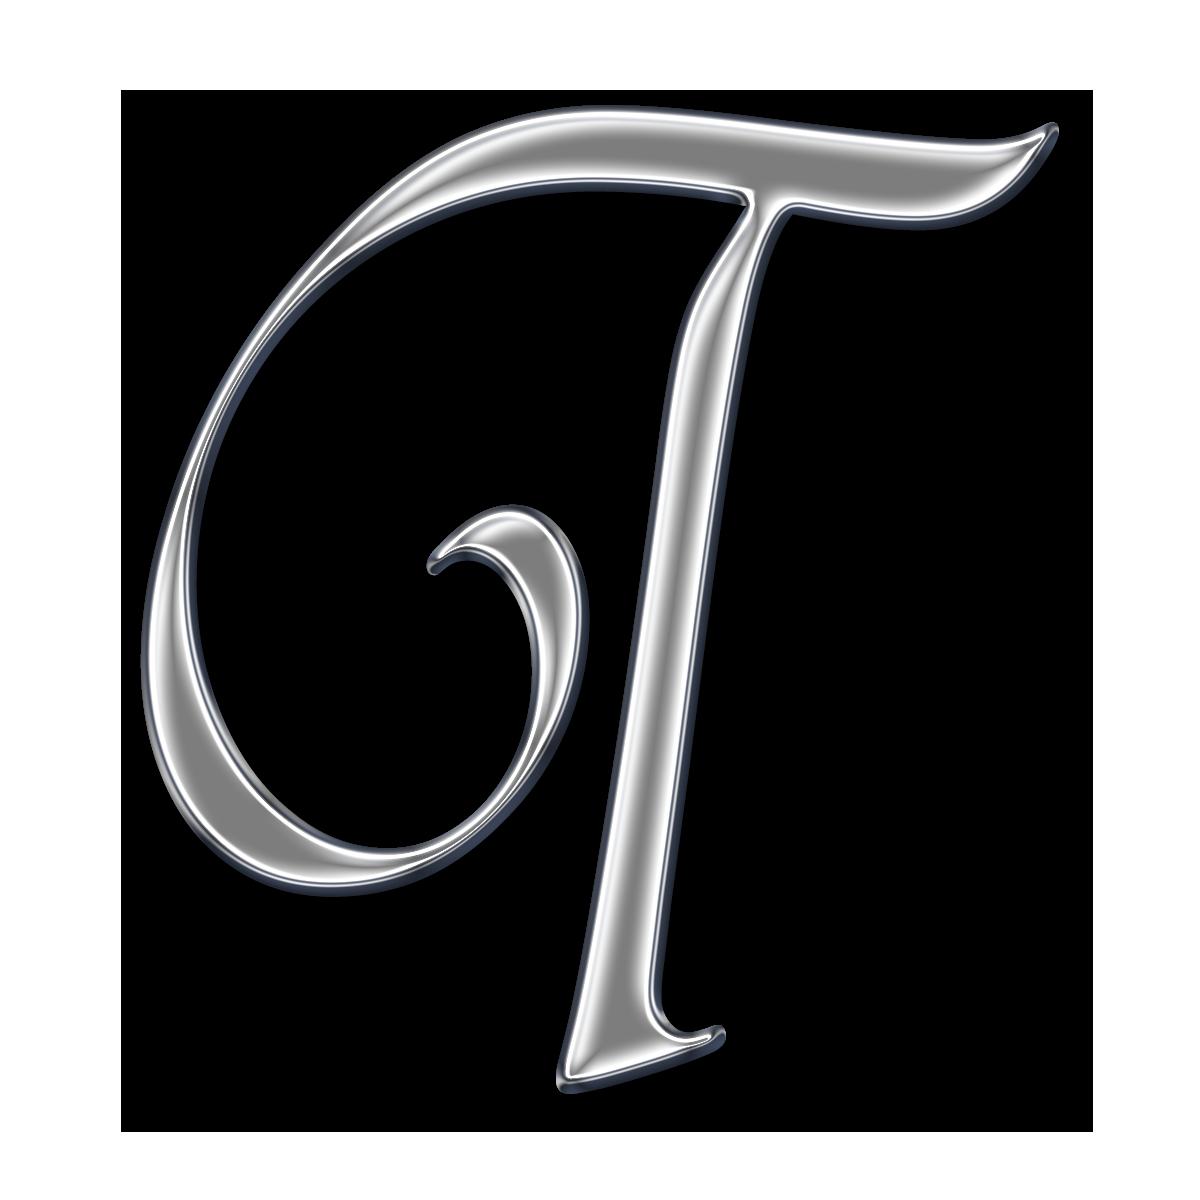 CAPITAL-LETTER-T-FREE-ALPHA.png (1200×1200) | ALPHABET ...